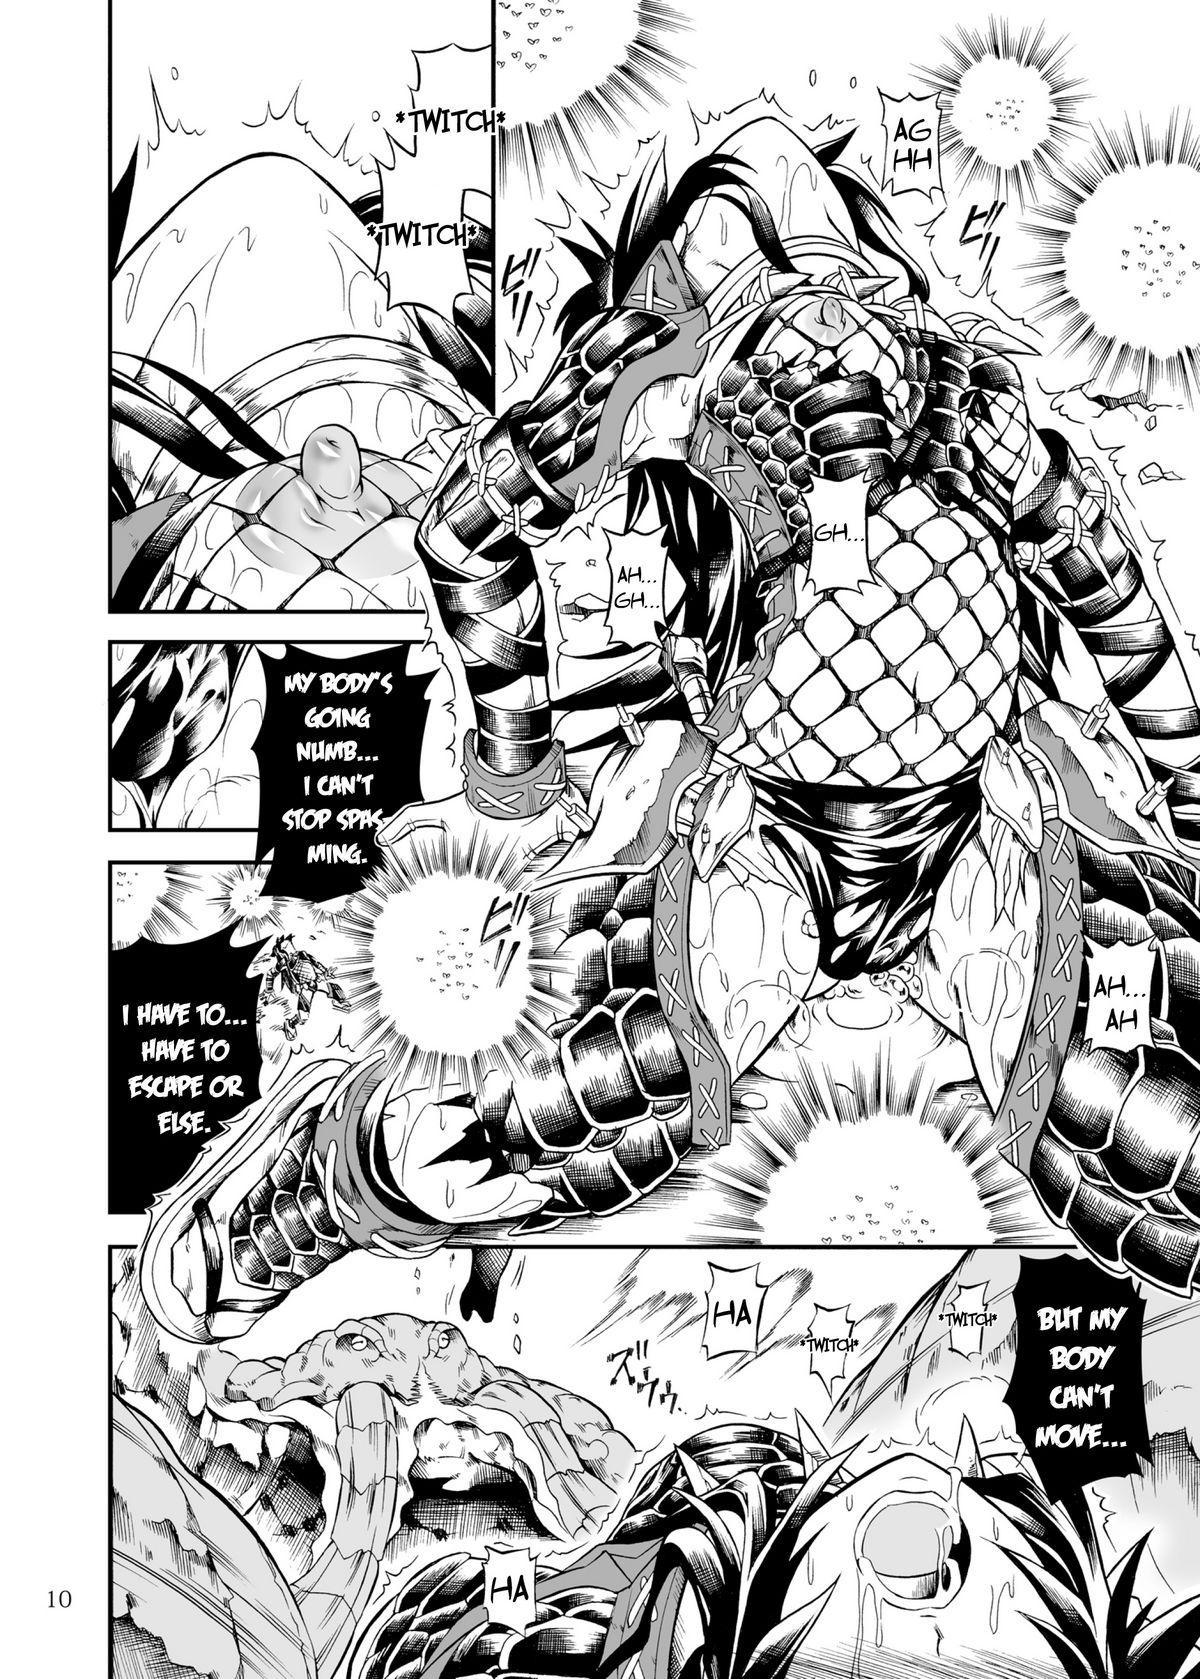 Solo Hunter no Seitai 2 the first part 9